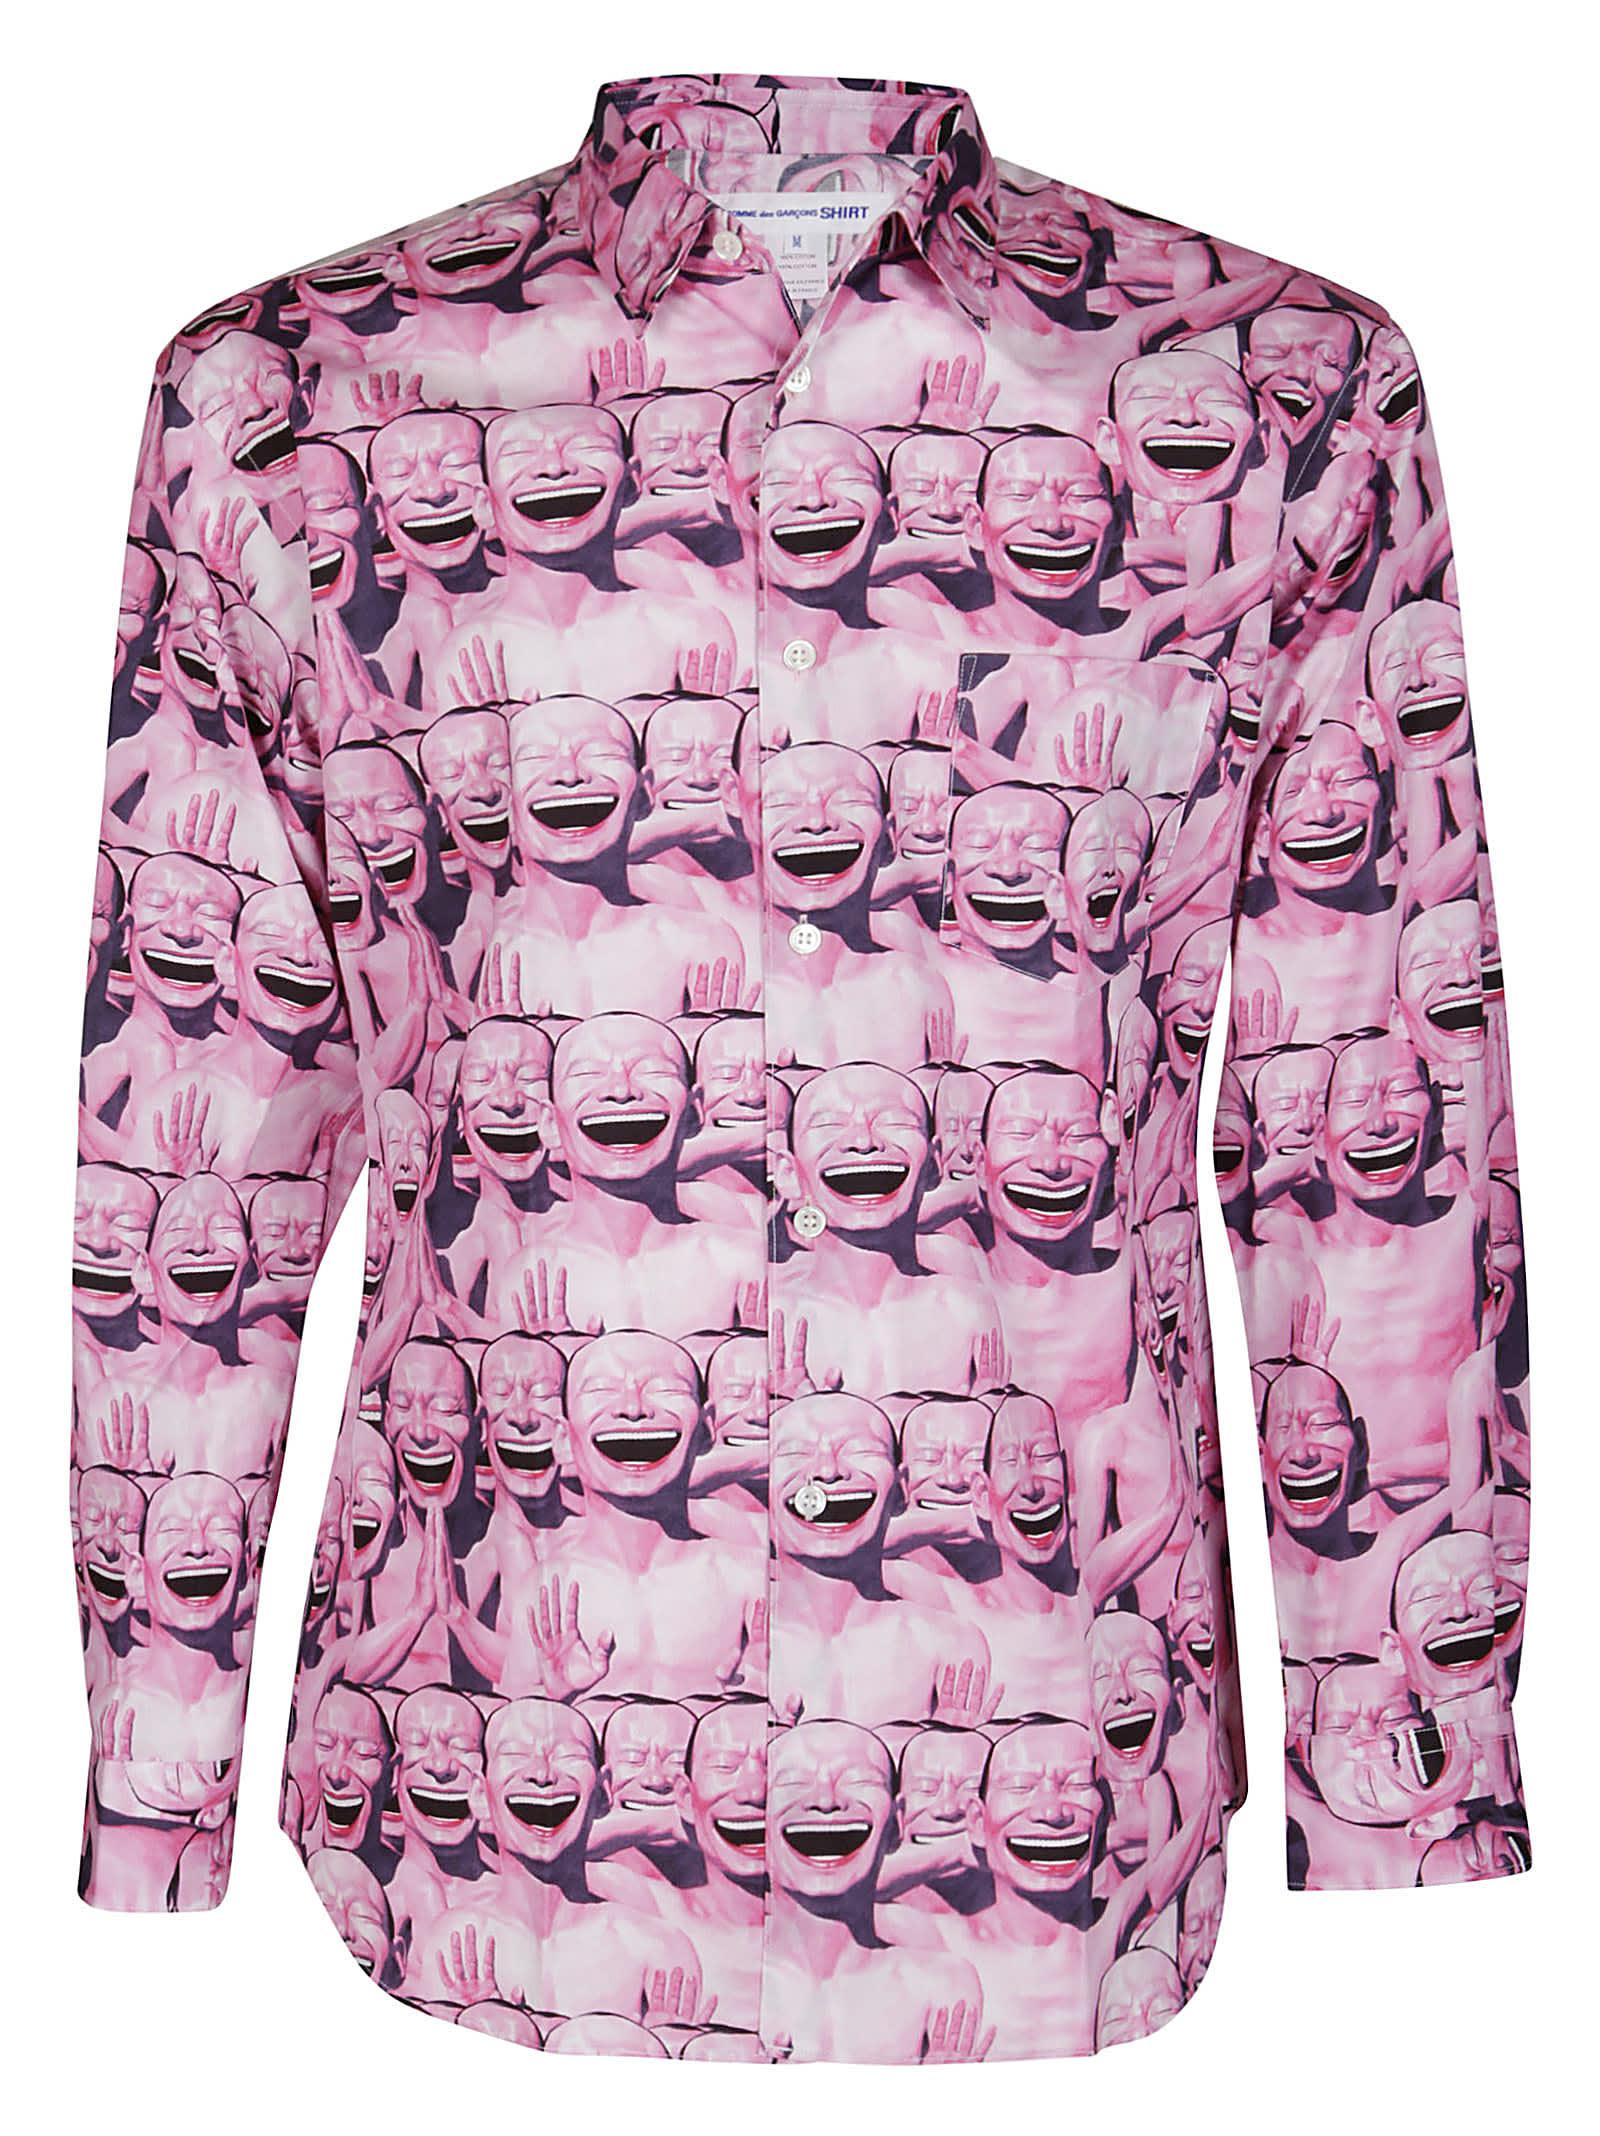 Comme Des Garçons Shirt Clothing PINK COTTON SHIRT